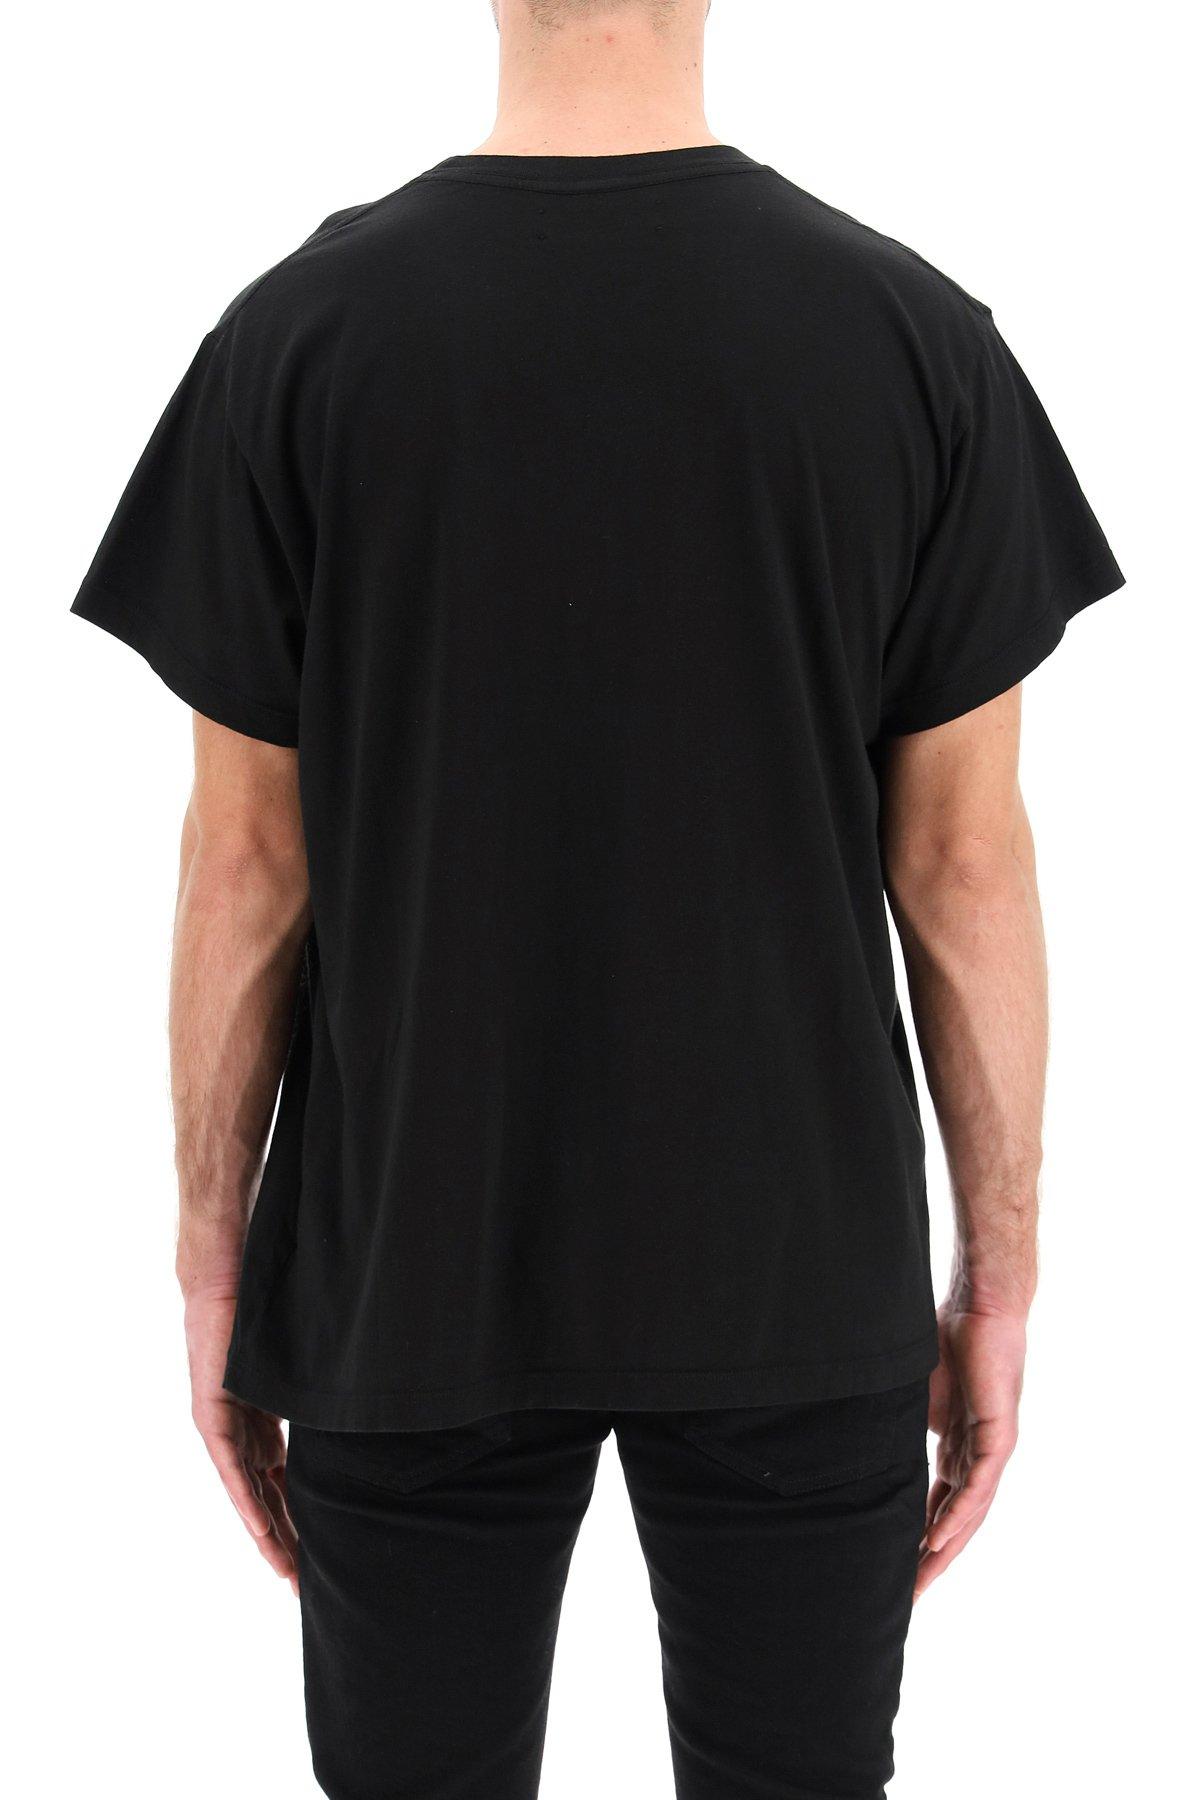 Amiri t-shirt logo amiri core